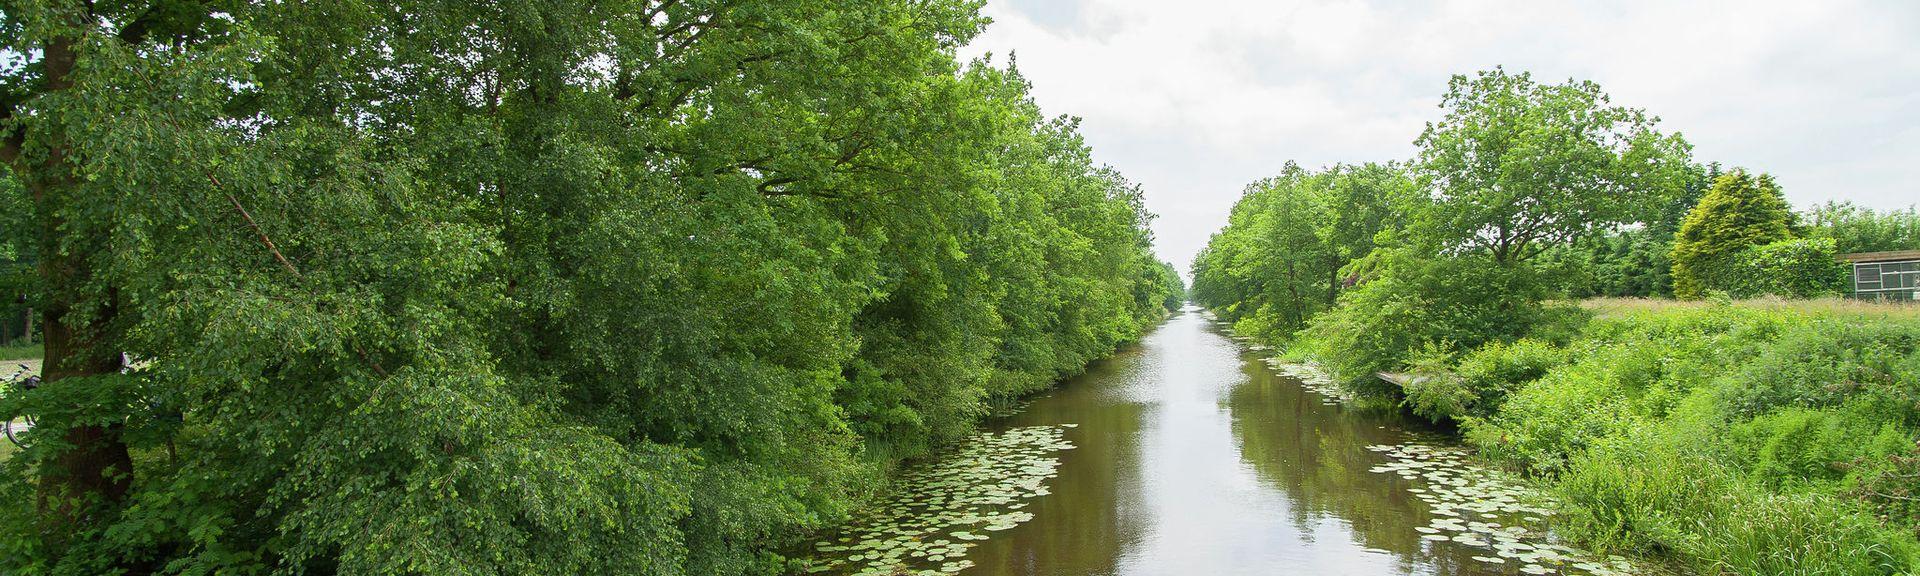 Echten, Drenthe, Países Bajos